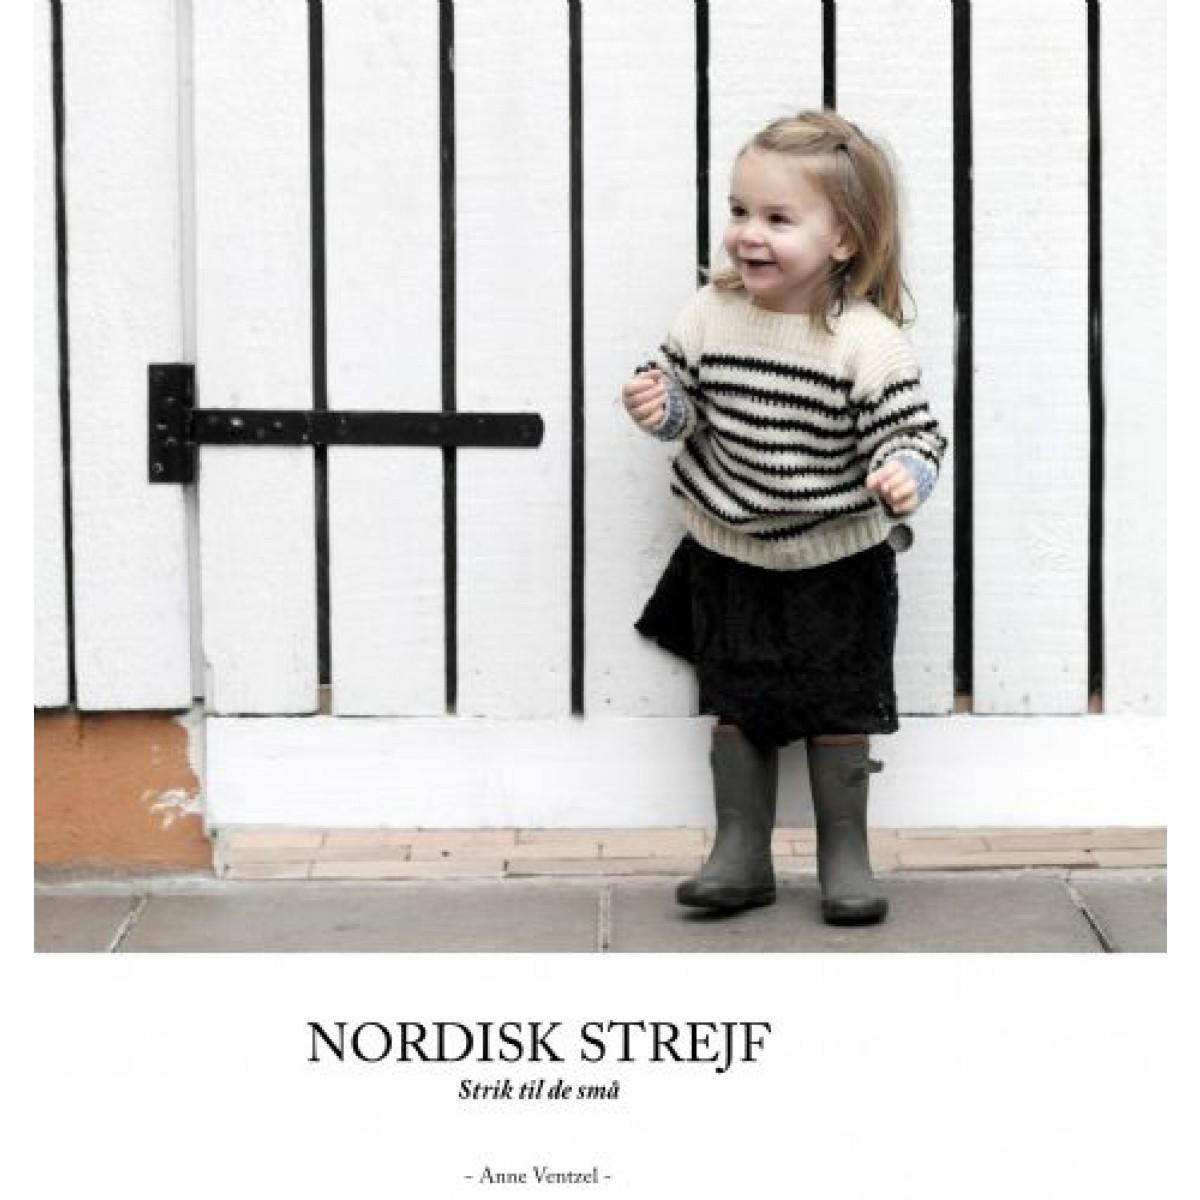 NordiskStrejfAnneVentzel-31